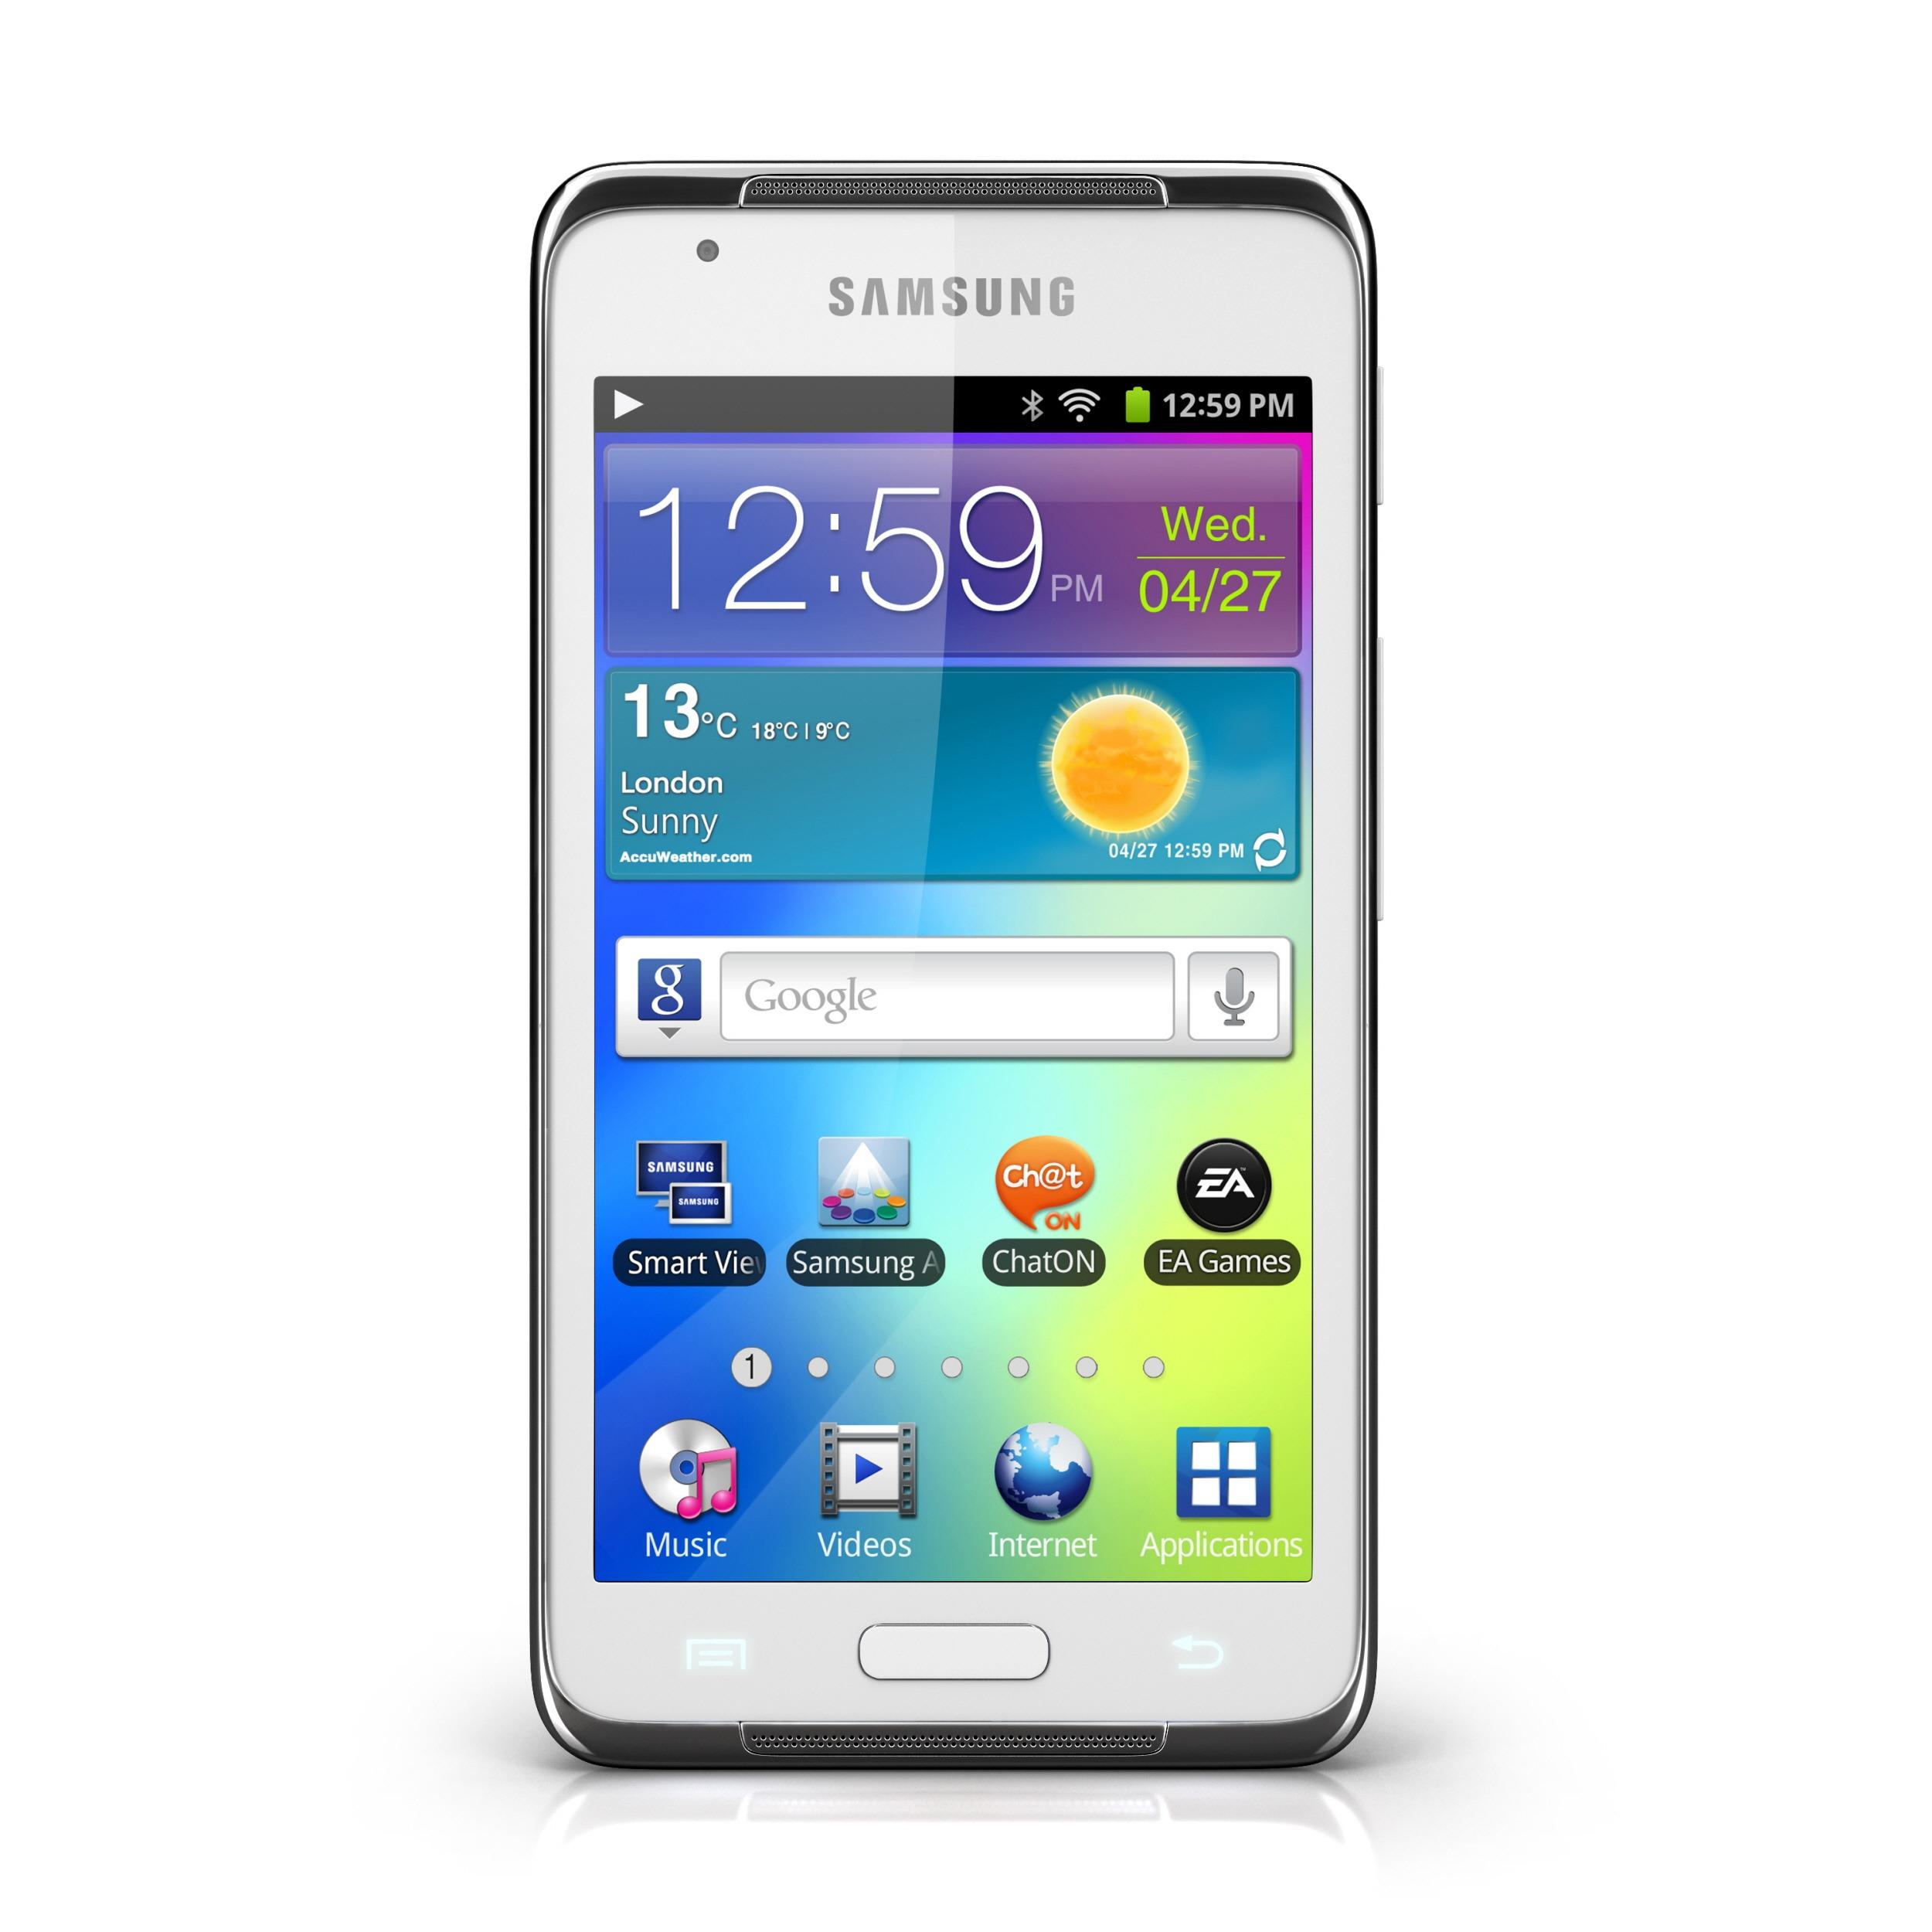 MWC 2012 | Samsung annuncia il Galaxy S Wifi 4.2